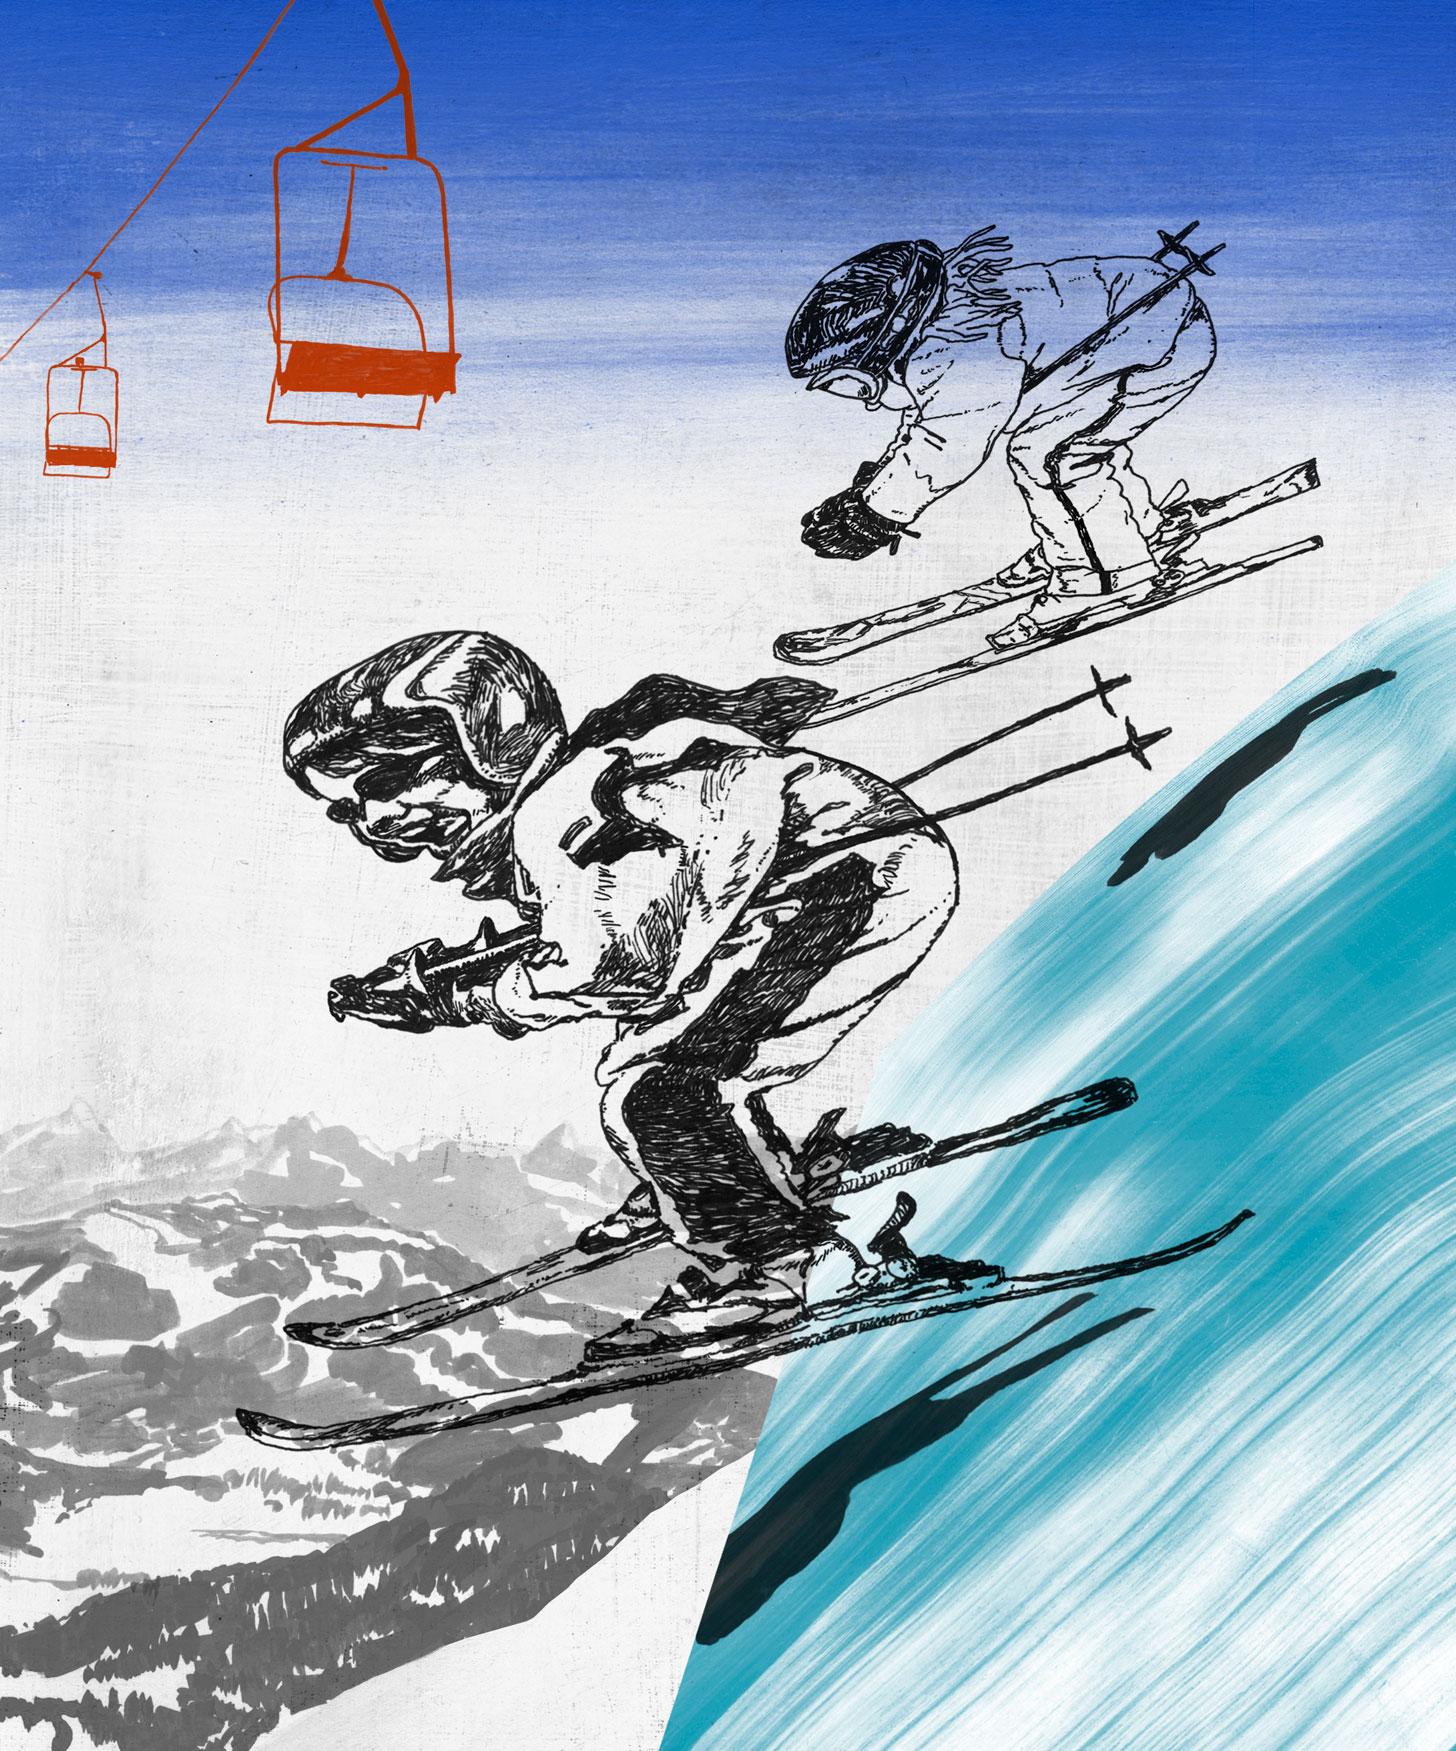 ski-kids-w.jpg